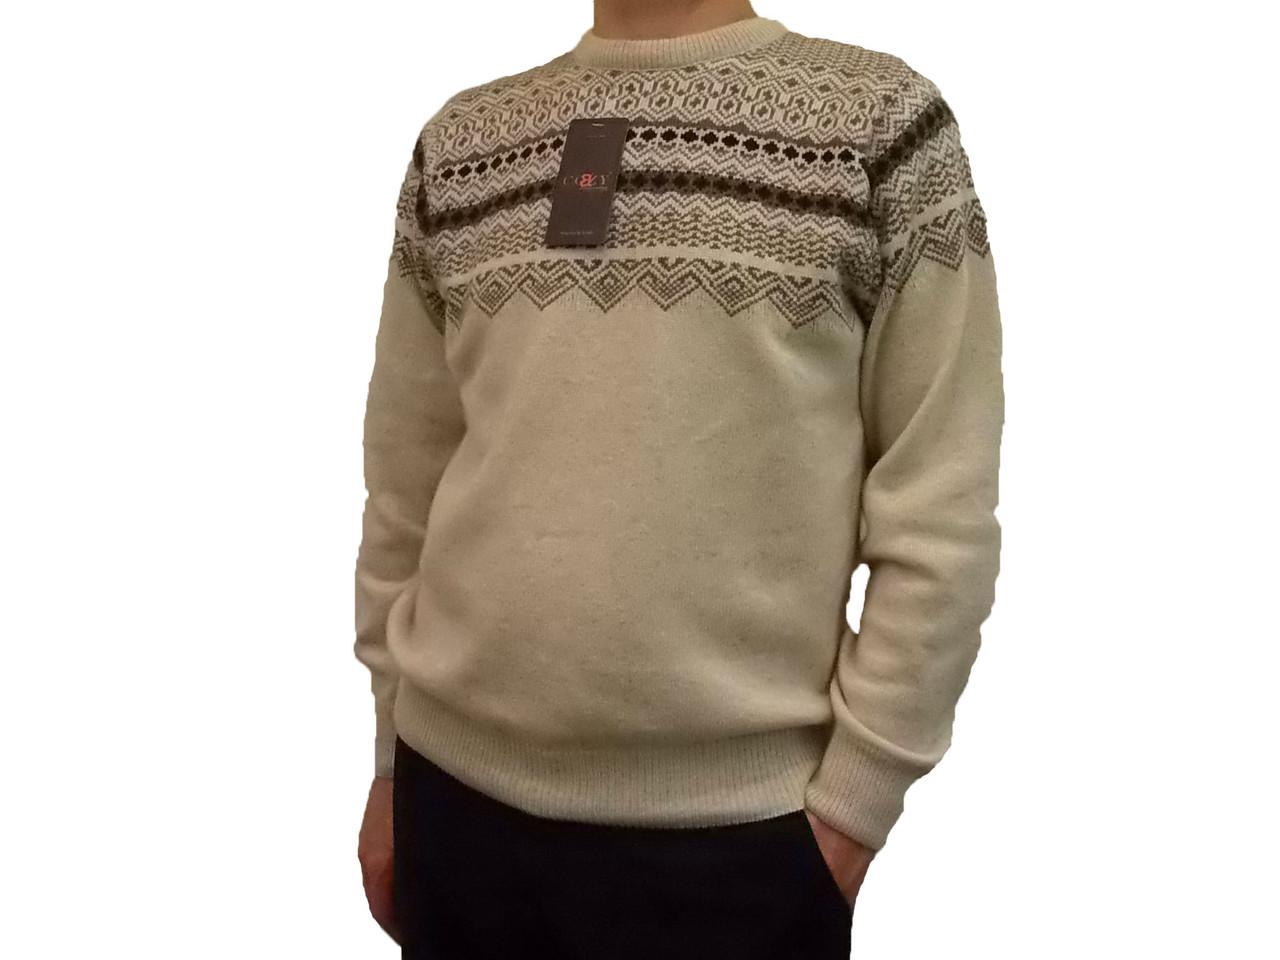 Мужской теплый свитер № 1660 беж